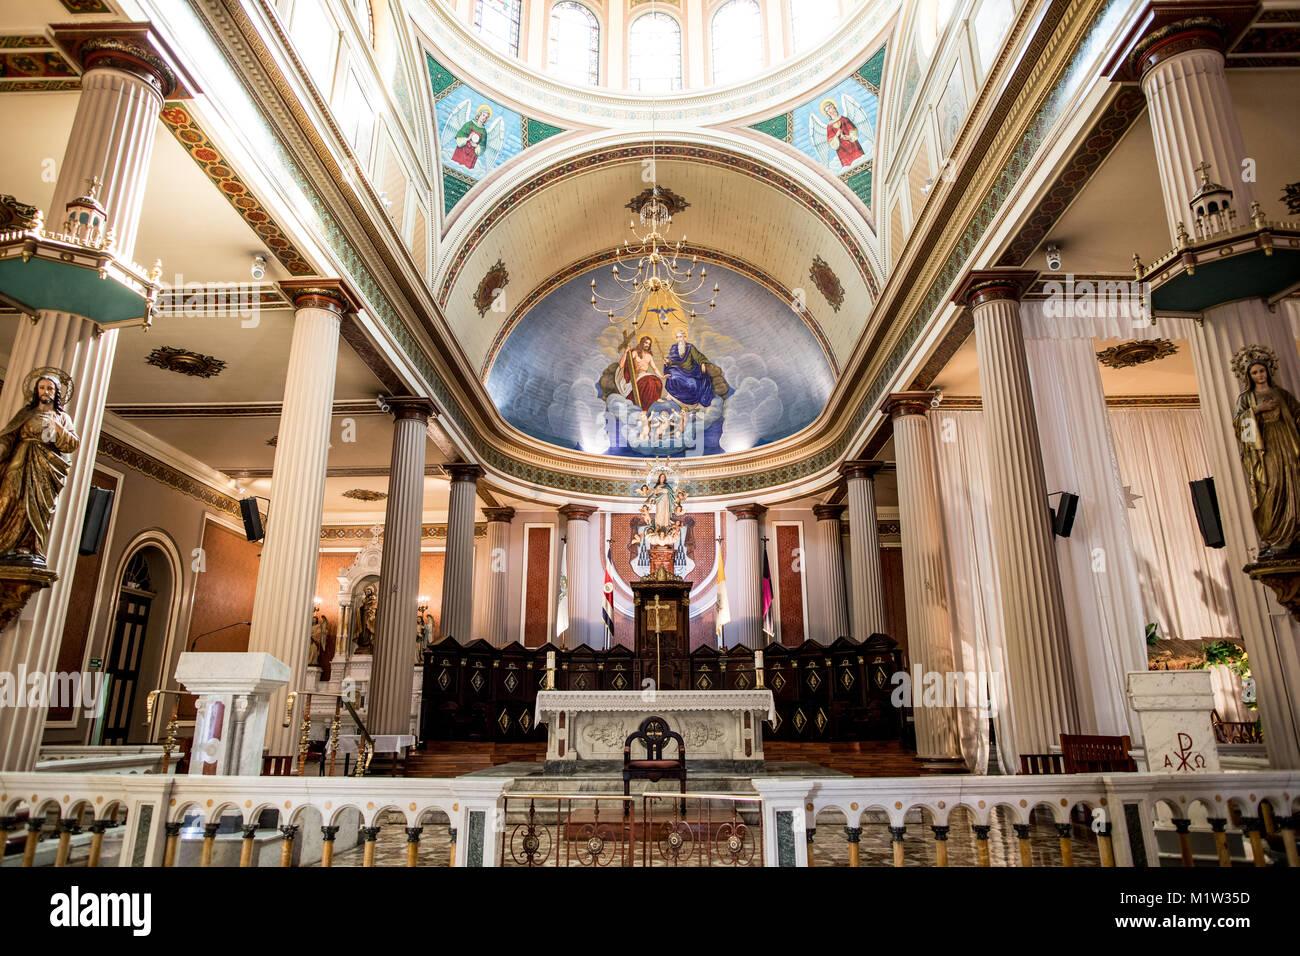 Cathedral Of San Jose Stock Photos & Cathedral Of San Jose Stock ...